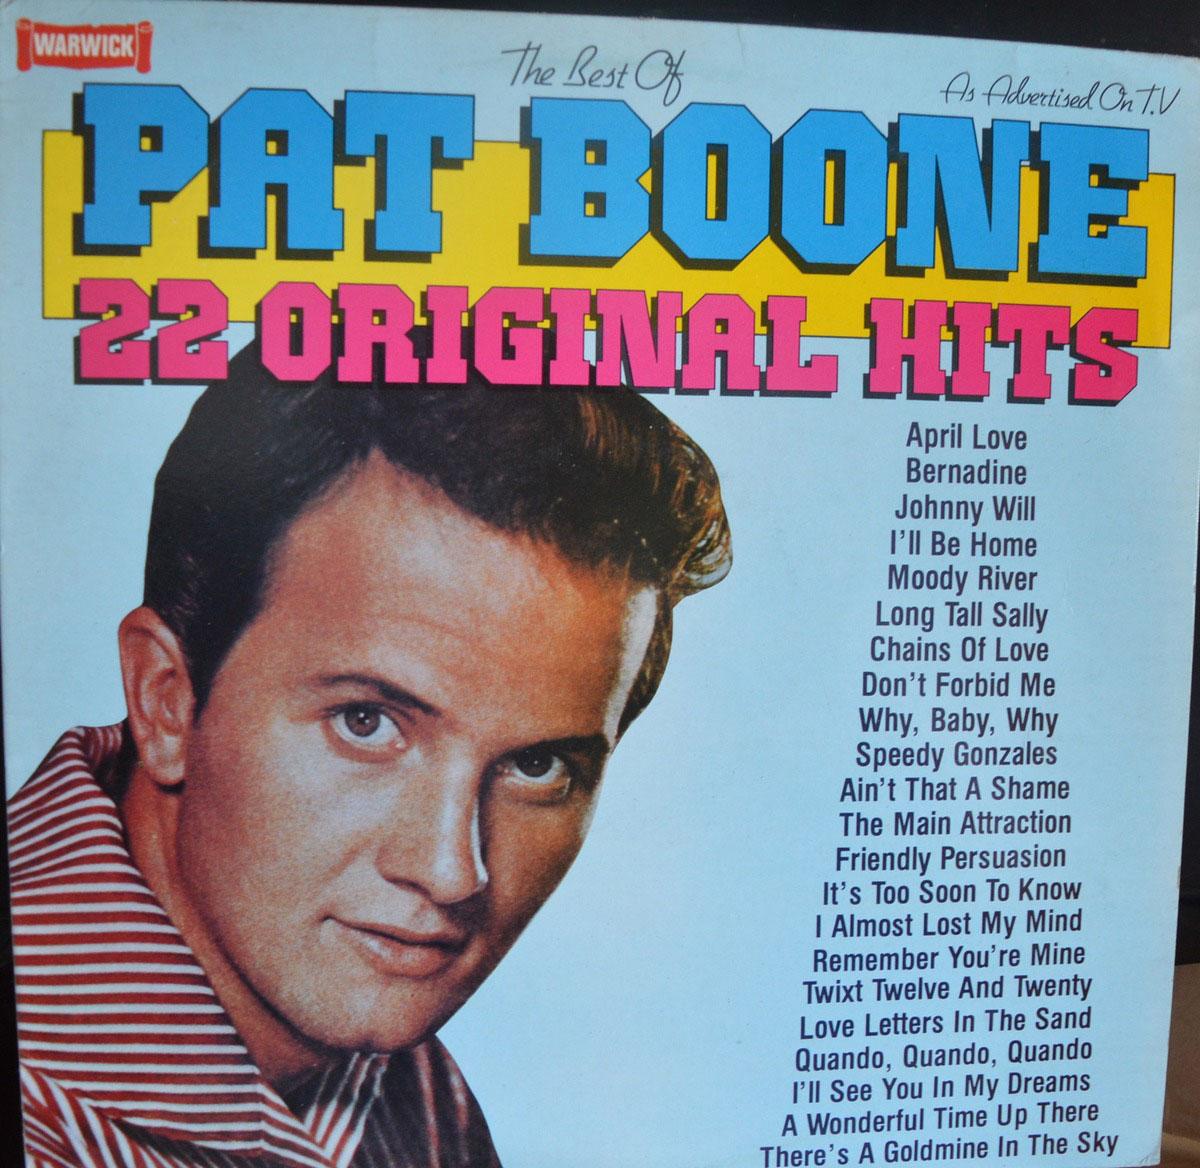 Pat Boone The Best Of Pat Boone Lp Buy From Vinylnet